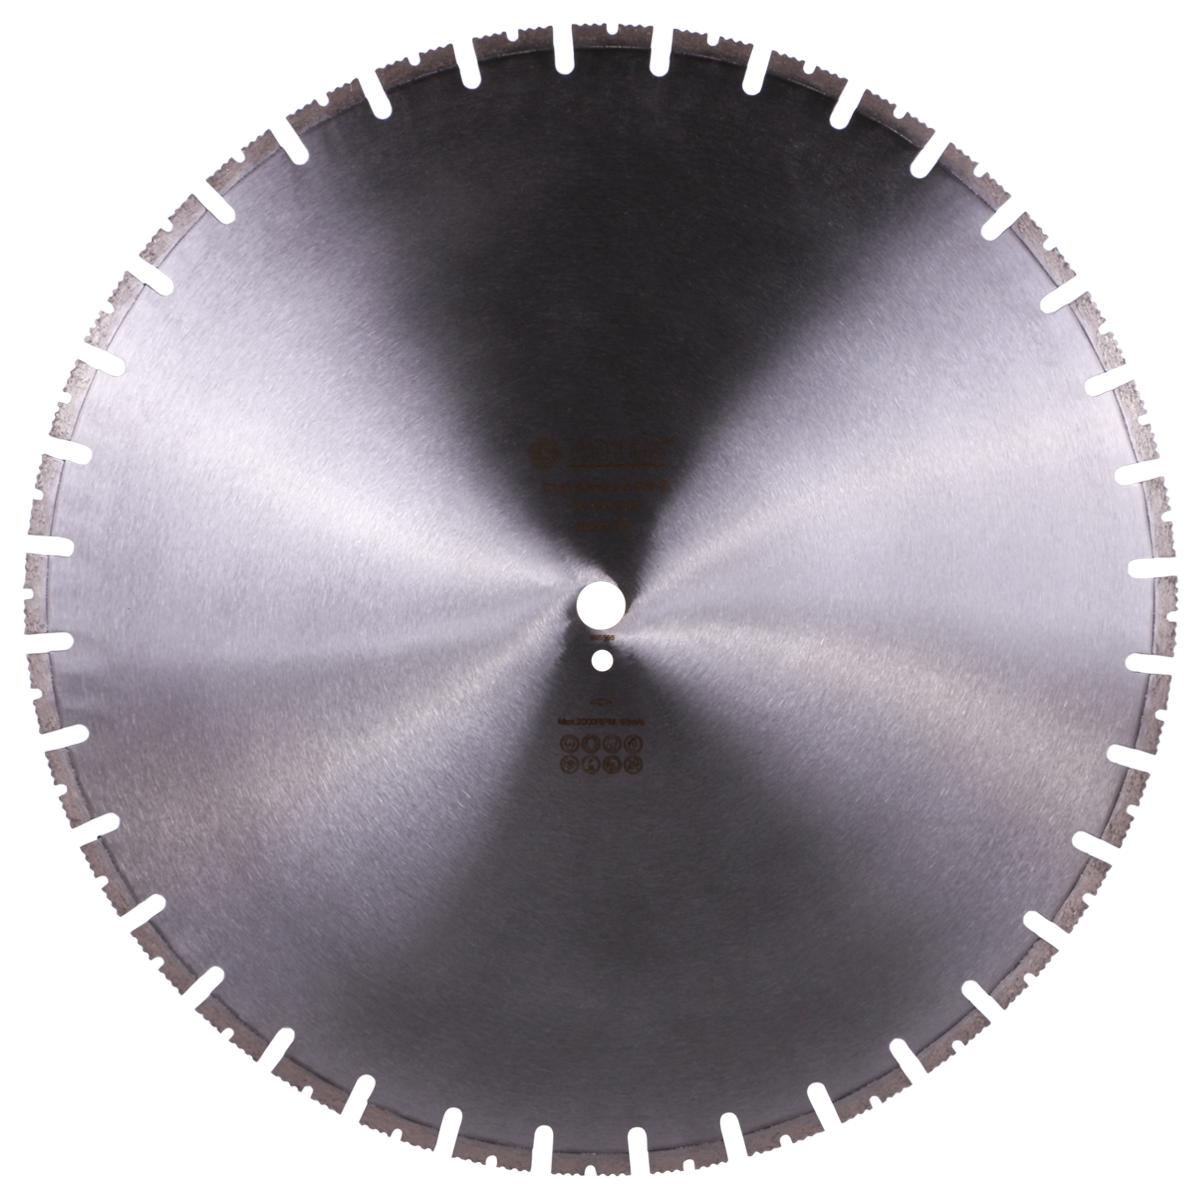 Круг алмазный отрезной ADTnS 1A1RSS/C1-W 604x4,5/3,5x12x25,4-36 F4 CLG 604/25,4 RS-Z